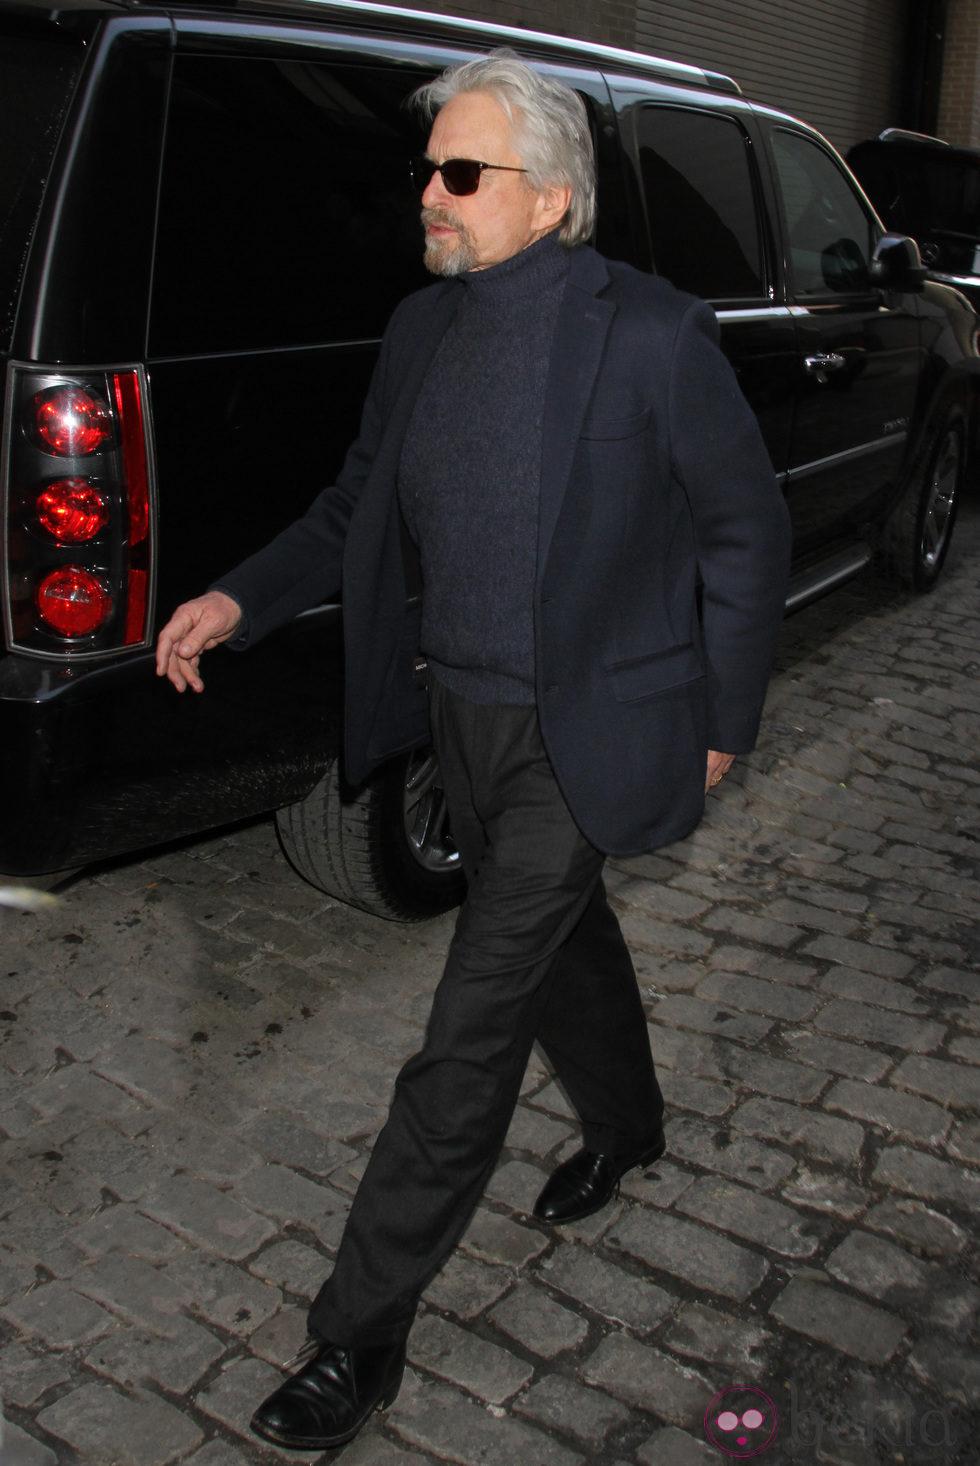 Michael Douglas en el desfile de Michael Kors en la Semana de la Moda de Nueva York 2014